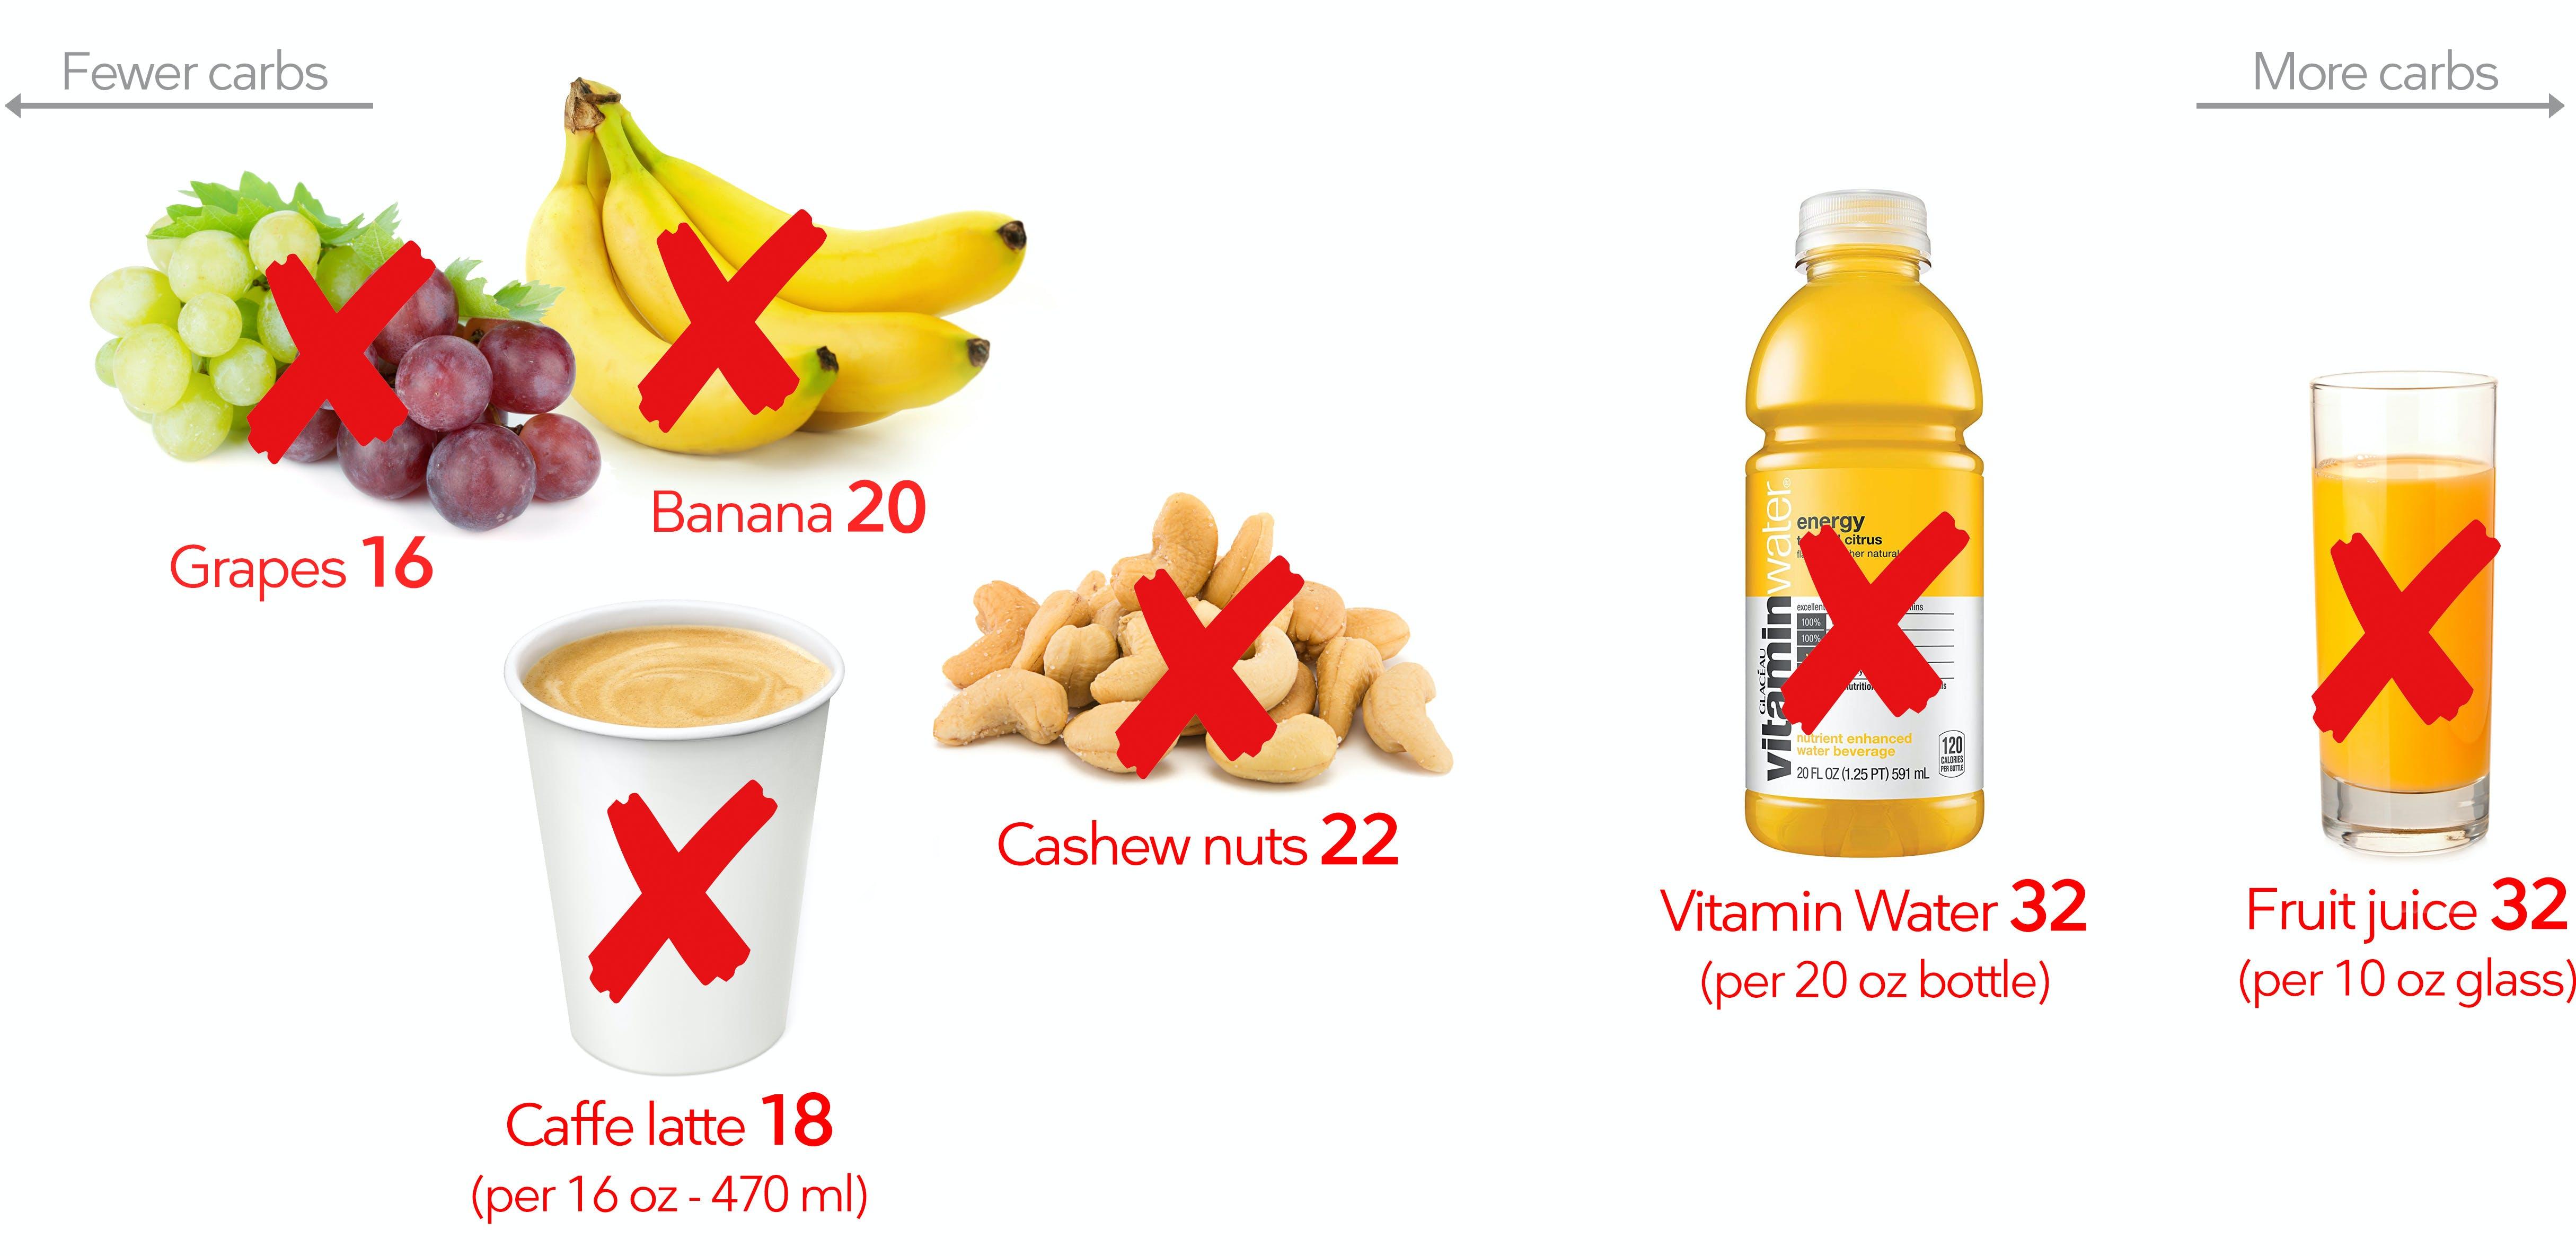 Common snacking mistakes on keto